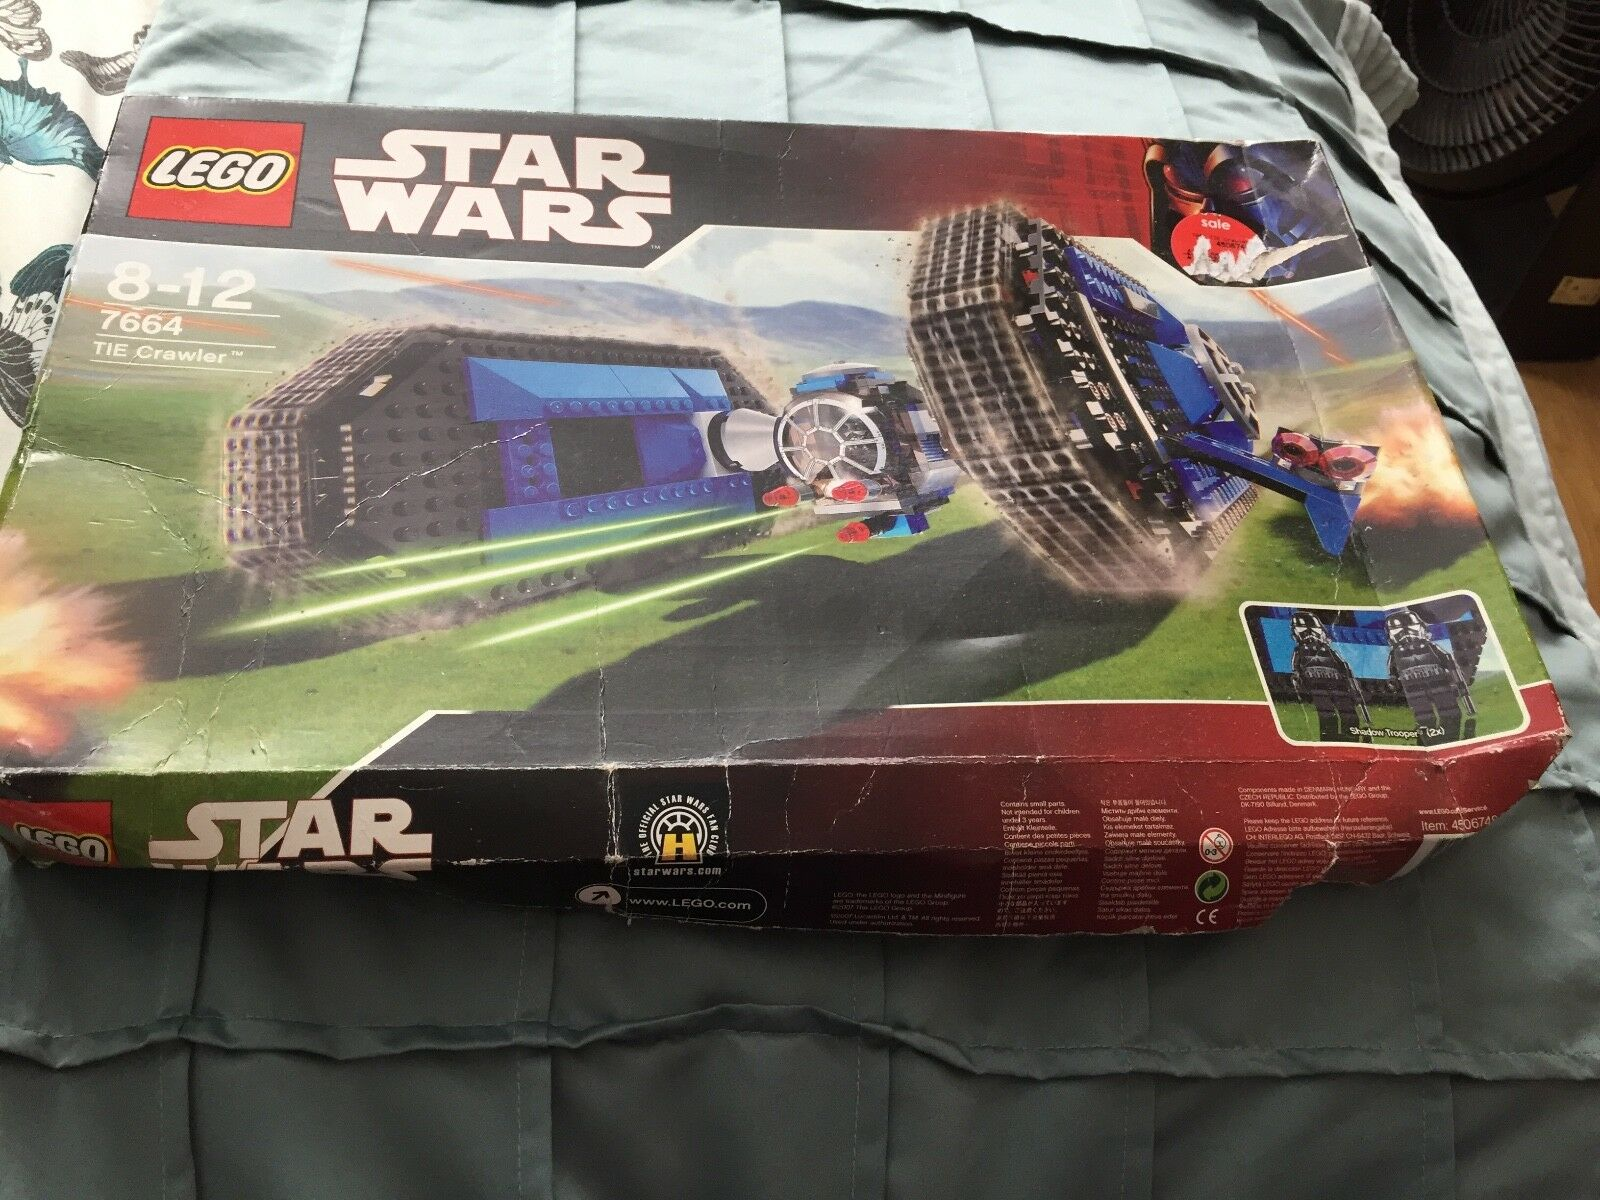 Starwsrs Lego CRAWLER NO 7664